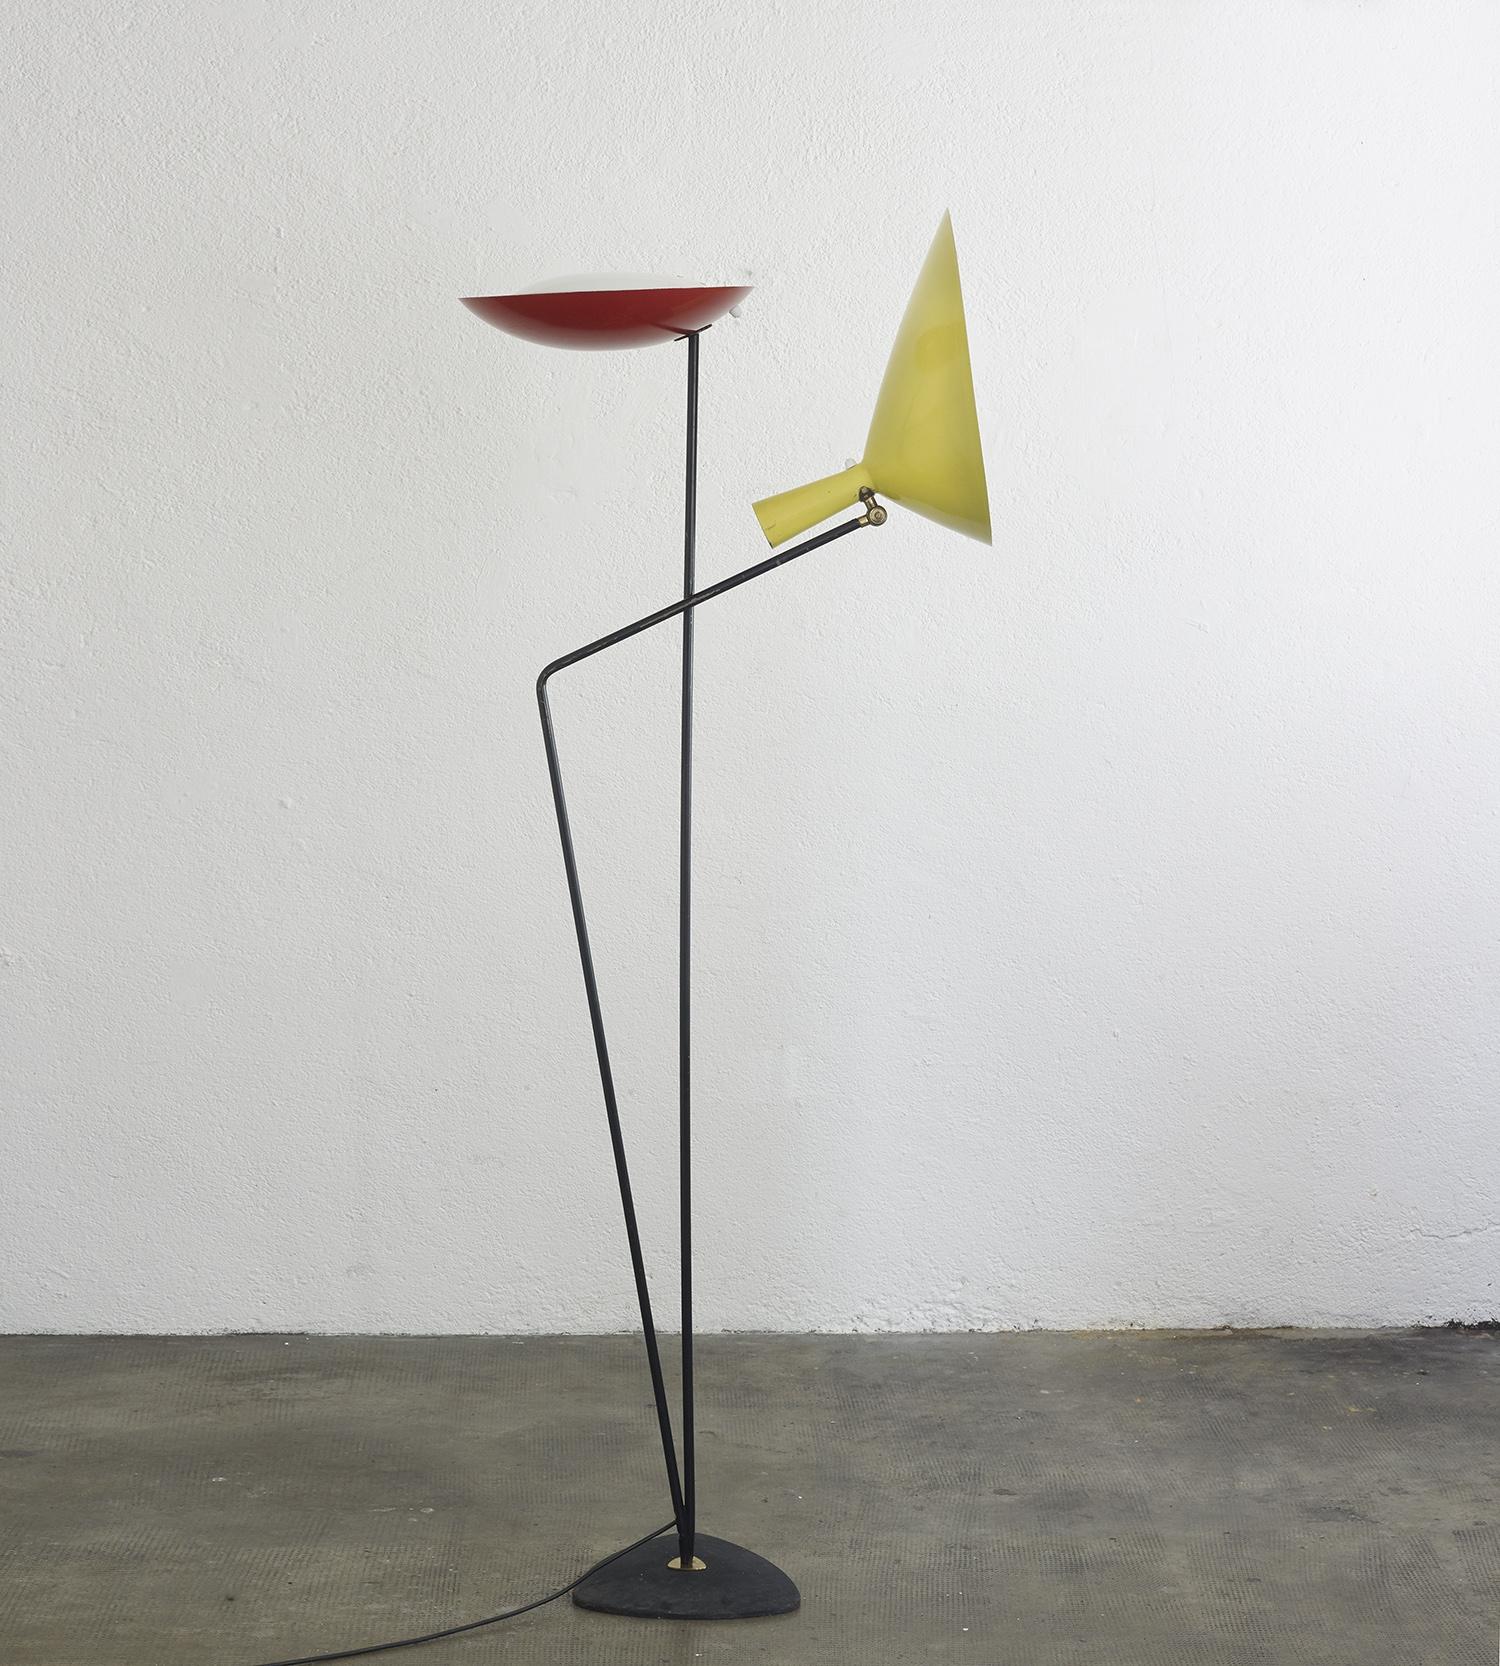 rare-lampe-de-sol-de-bag-turgi-1950-image-02